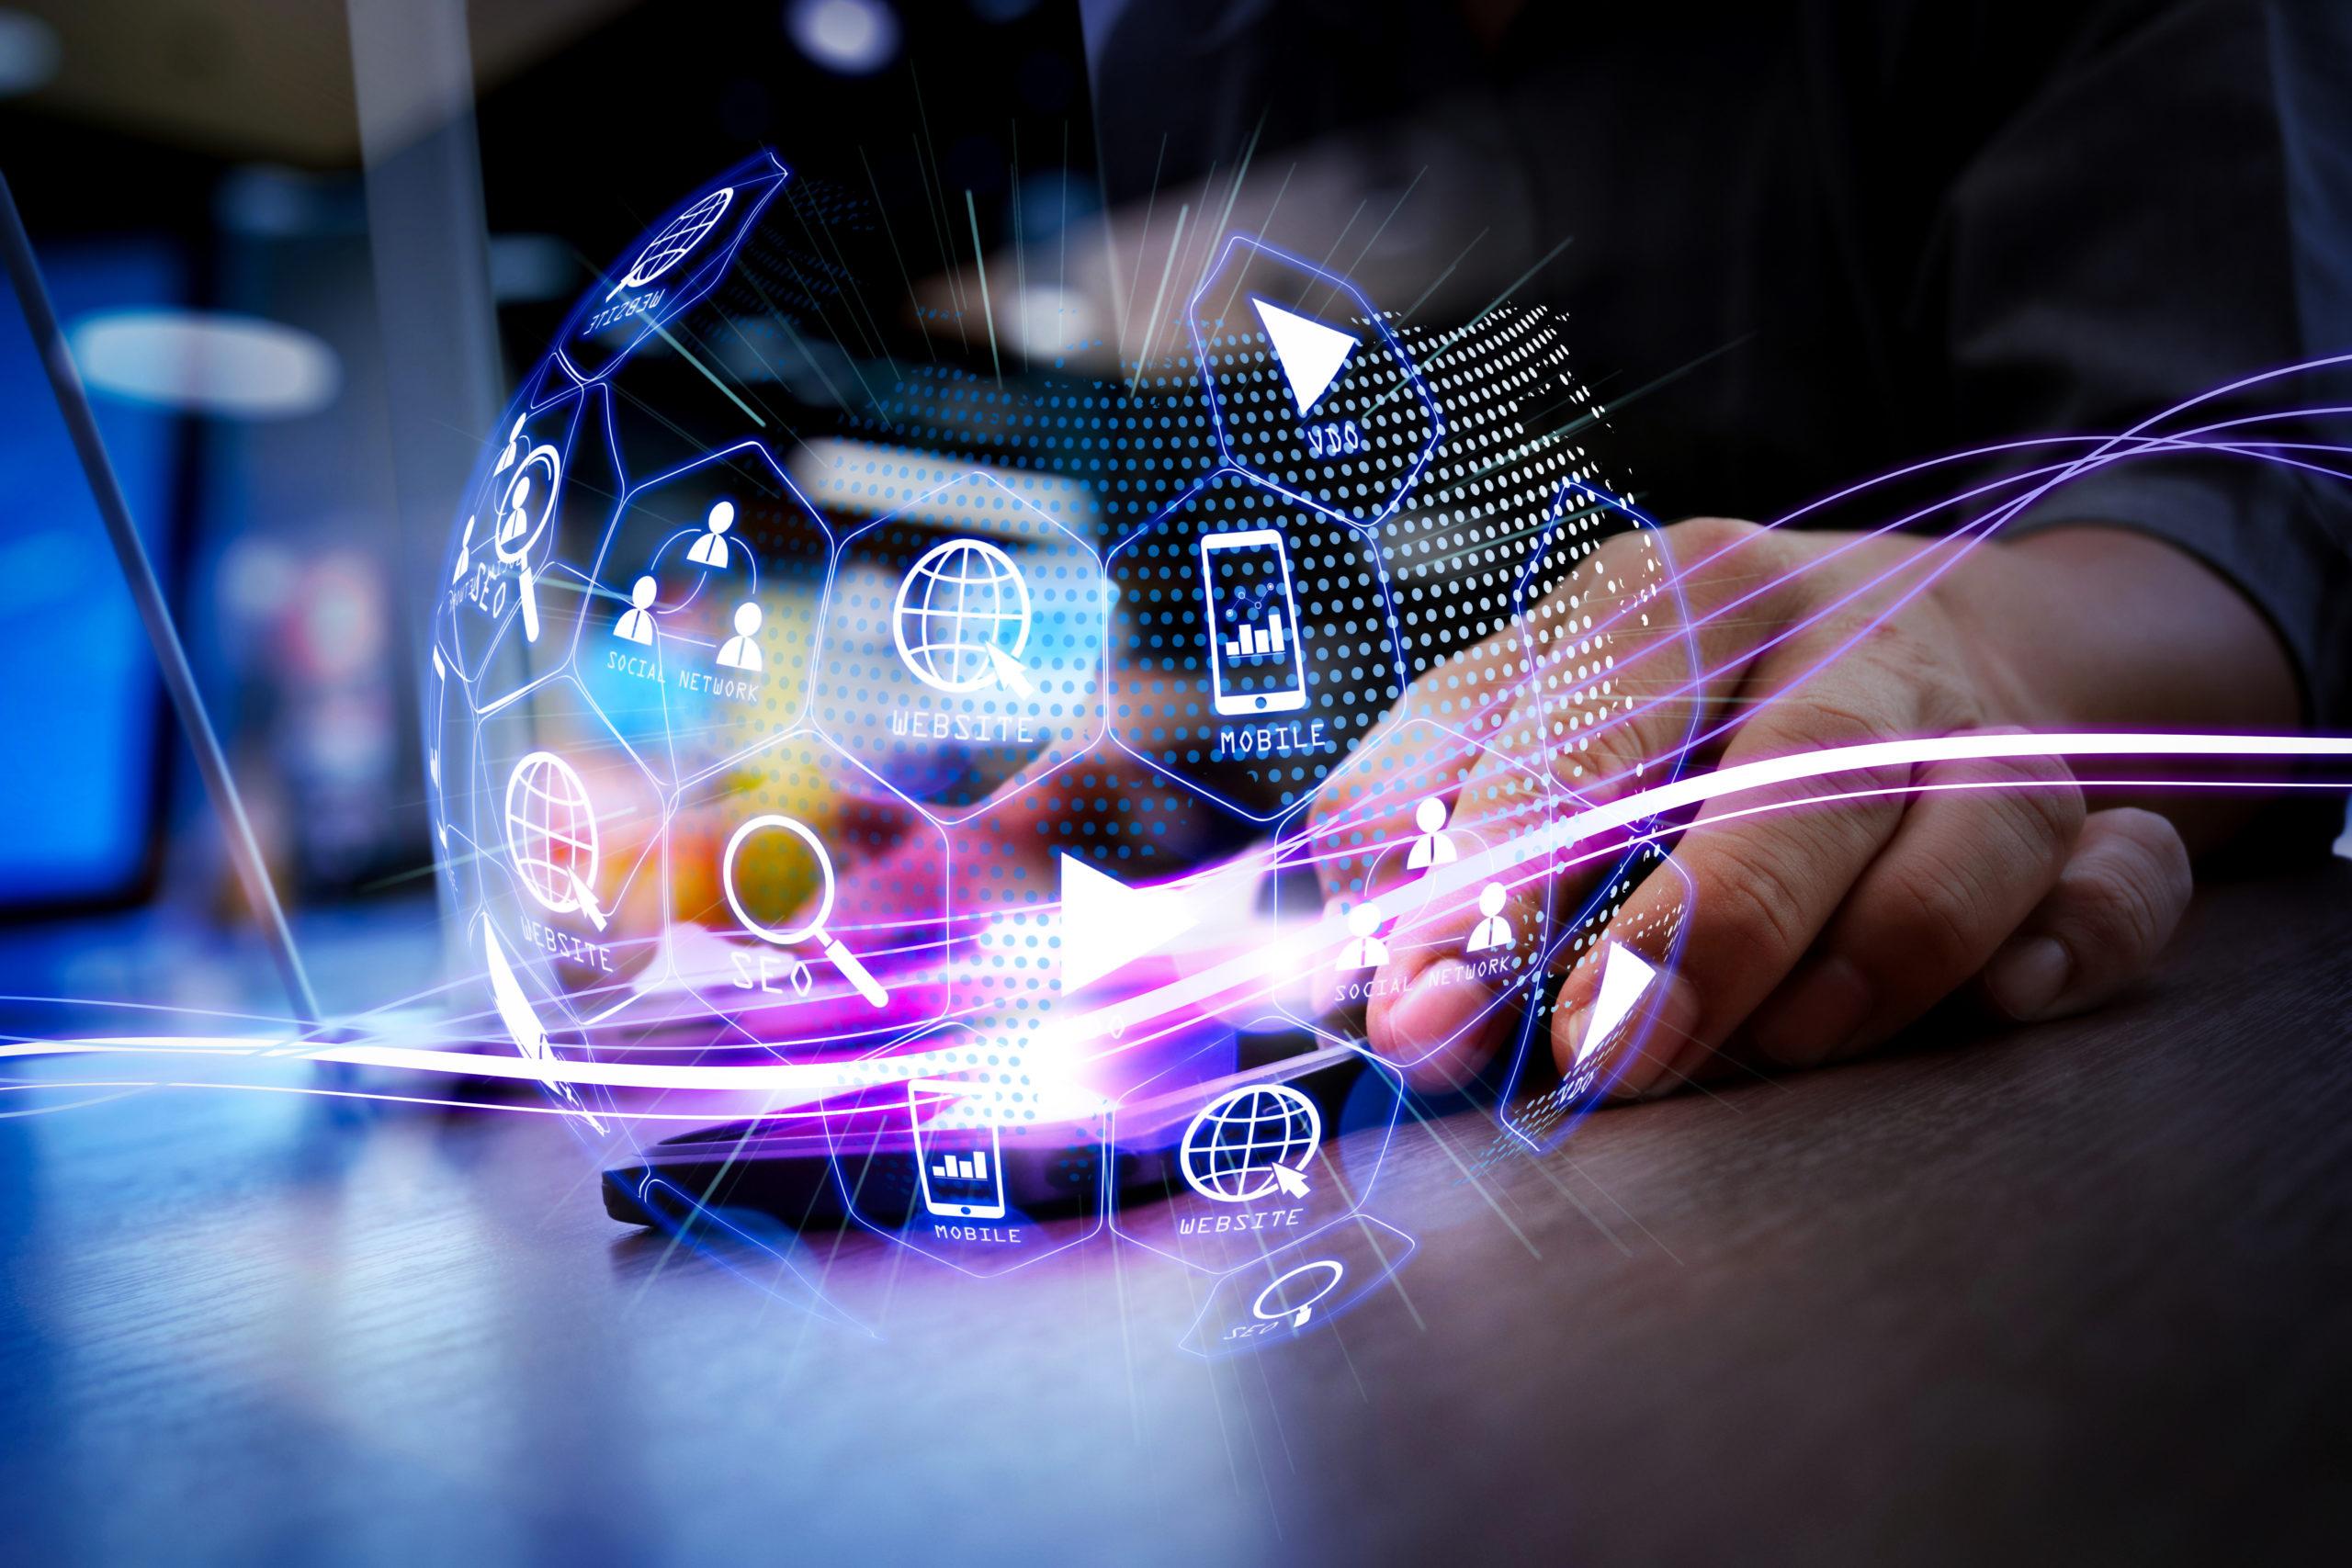 OMO : Online Merges With Offlineが進展した2020年、と言われるかもしれない話